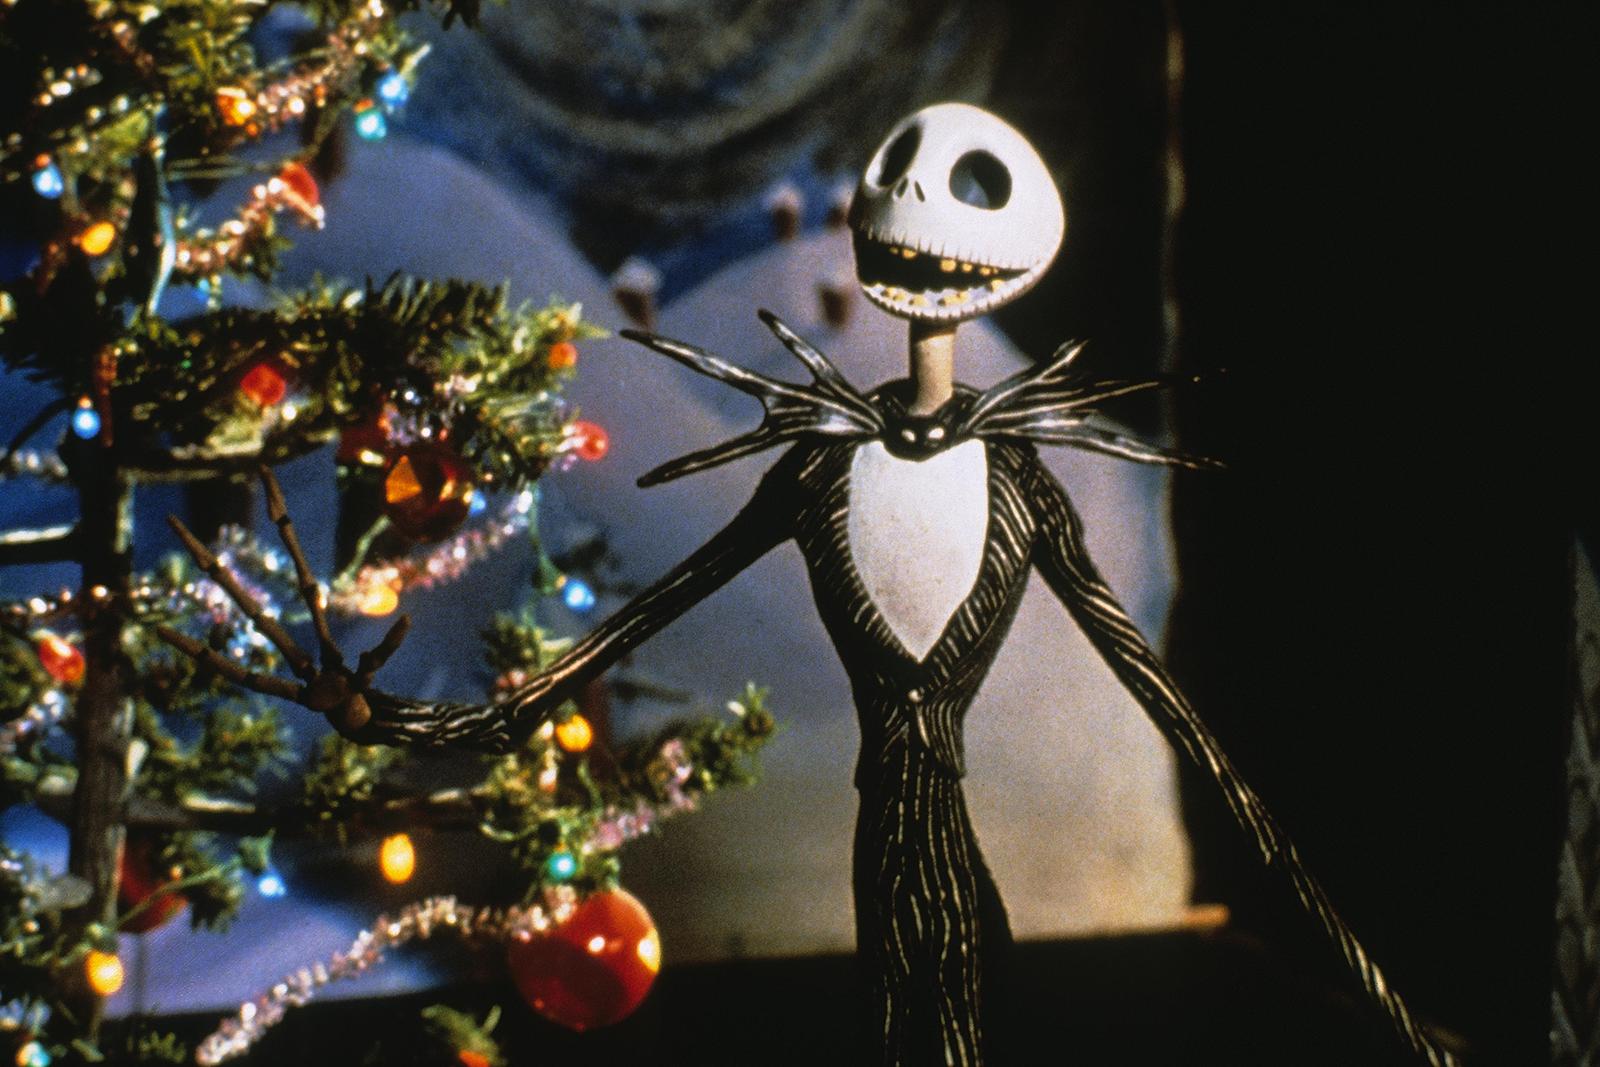 best holiday movies netflix hulu amazon prime movies - Nightmare Before Christmas Streaming